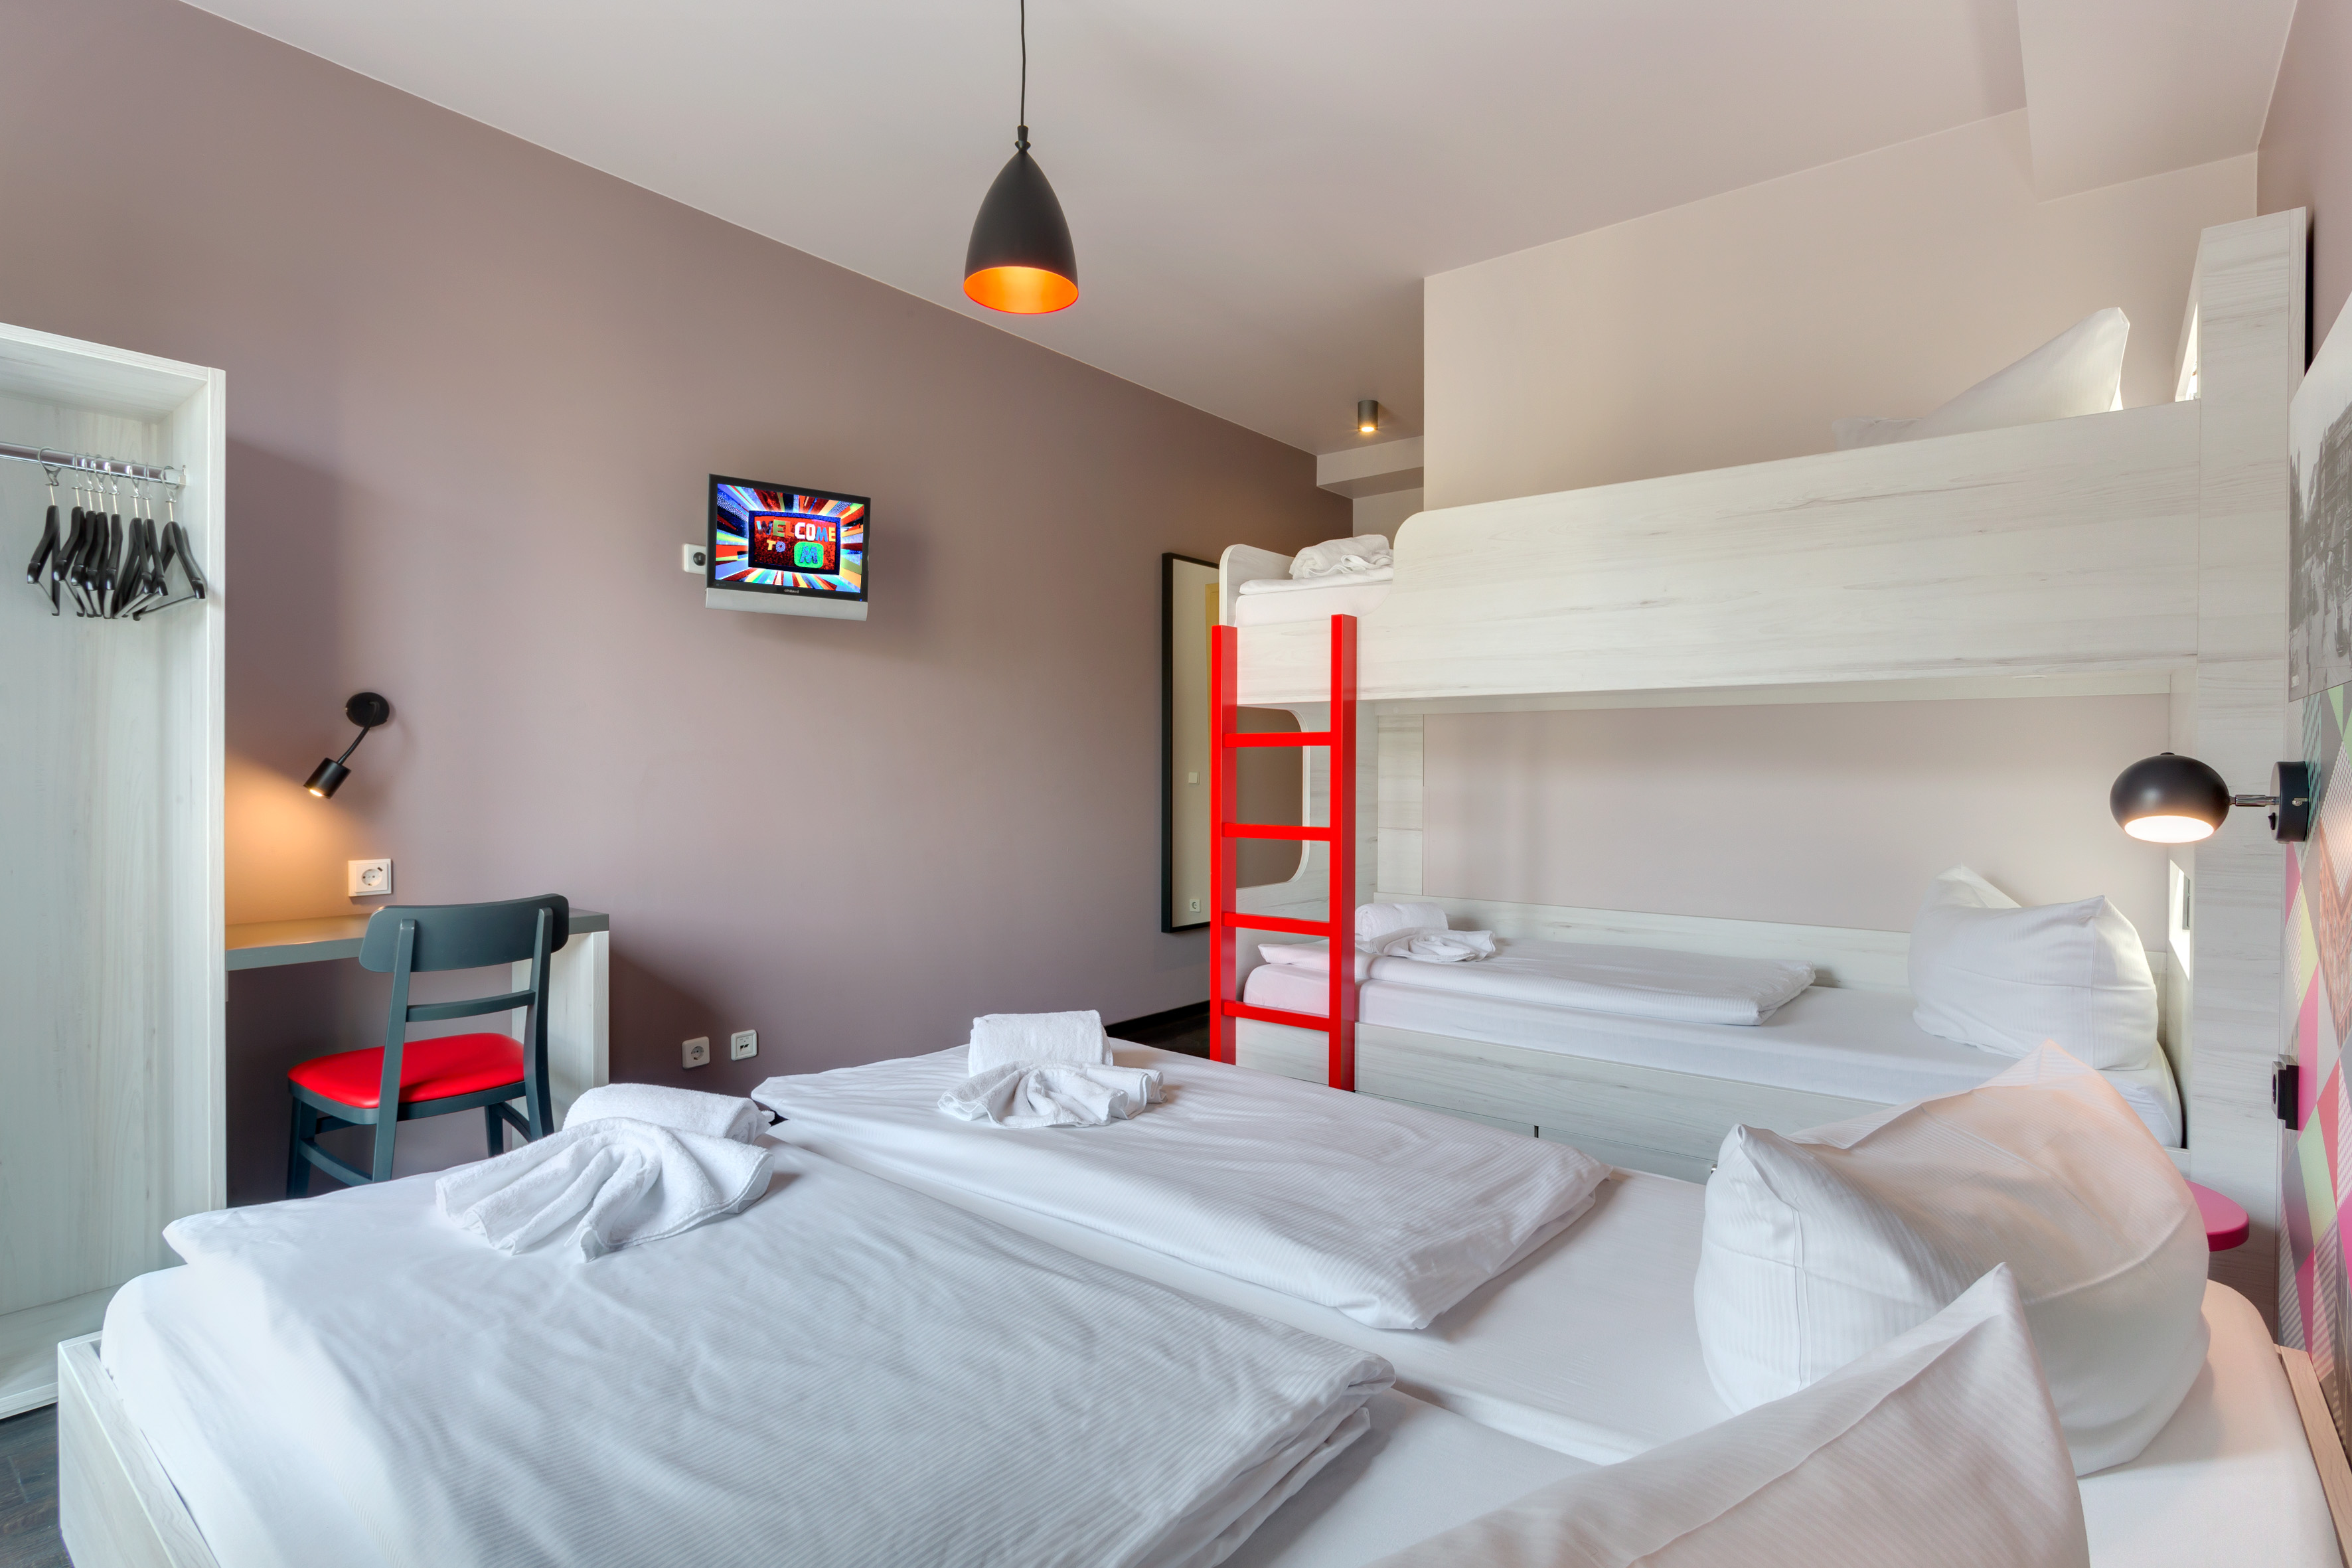 MEININGER Hotel Berlin Alexanderplatz - Multi-bed